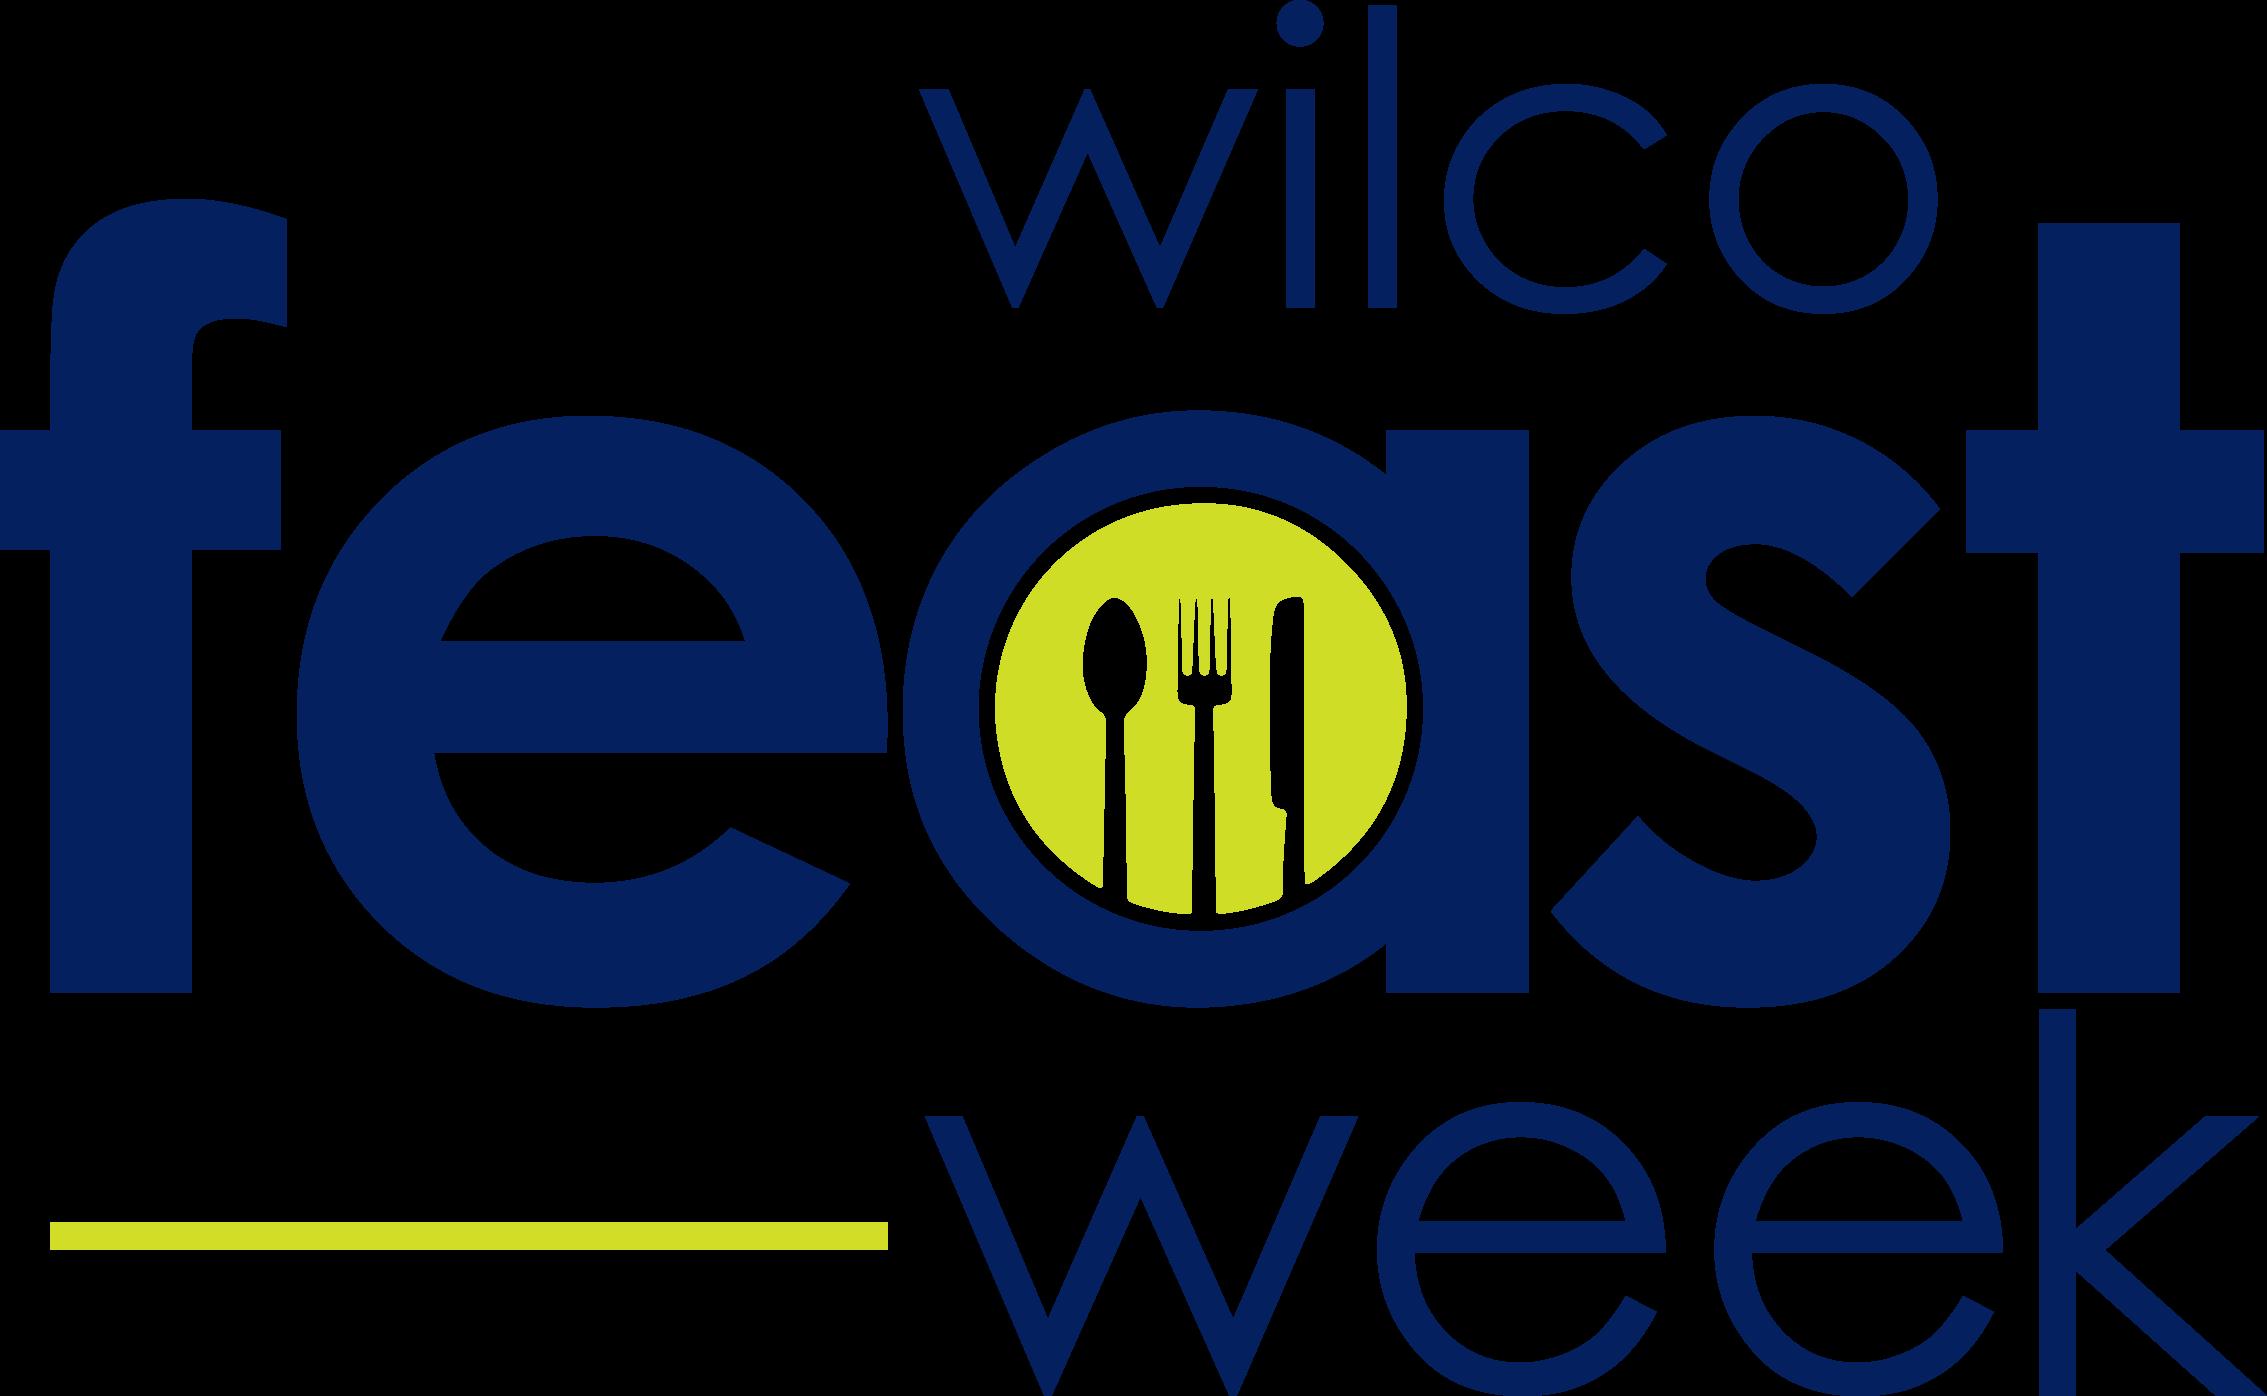 Wilco Feast Week